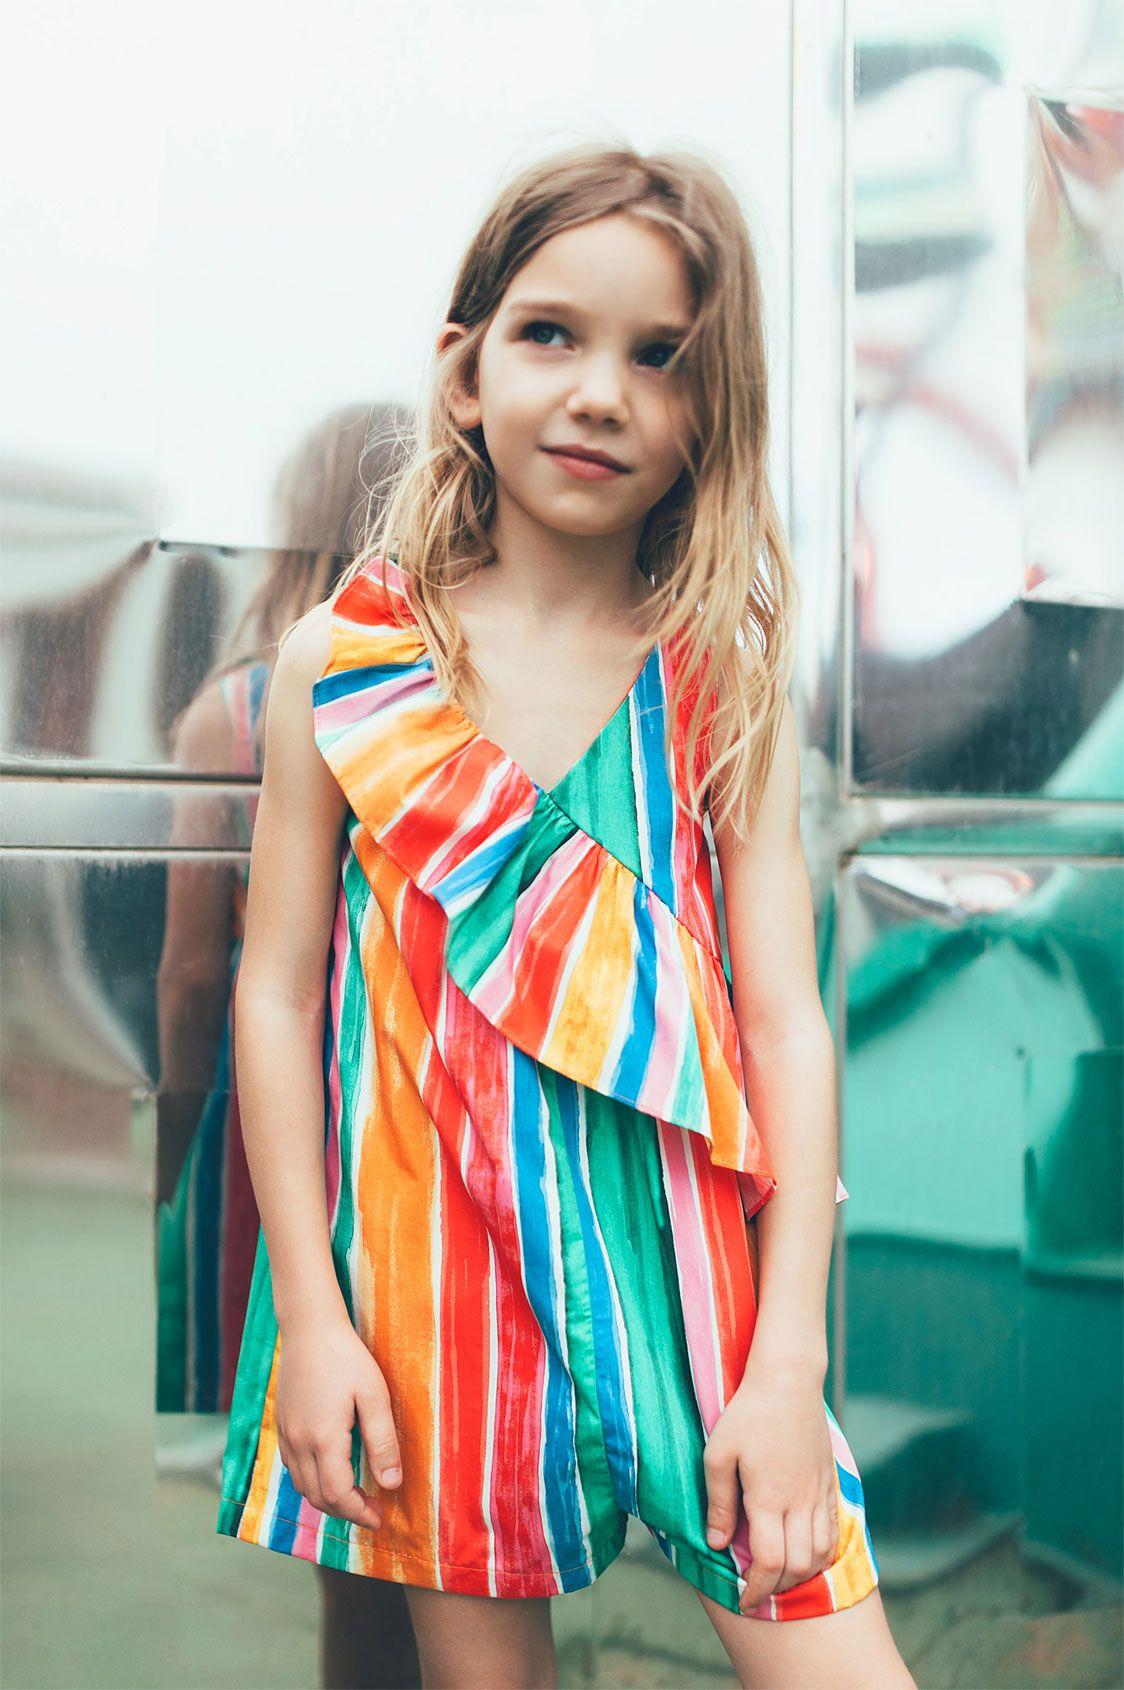 70b27bb30d Ρούχα Για Κορίτσια · Καλοκαιρινά Ρούχα · ZARA -  zaraeditorial  - KIDS -  SUMMER COLLECTION